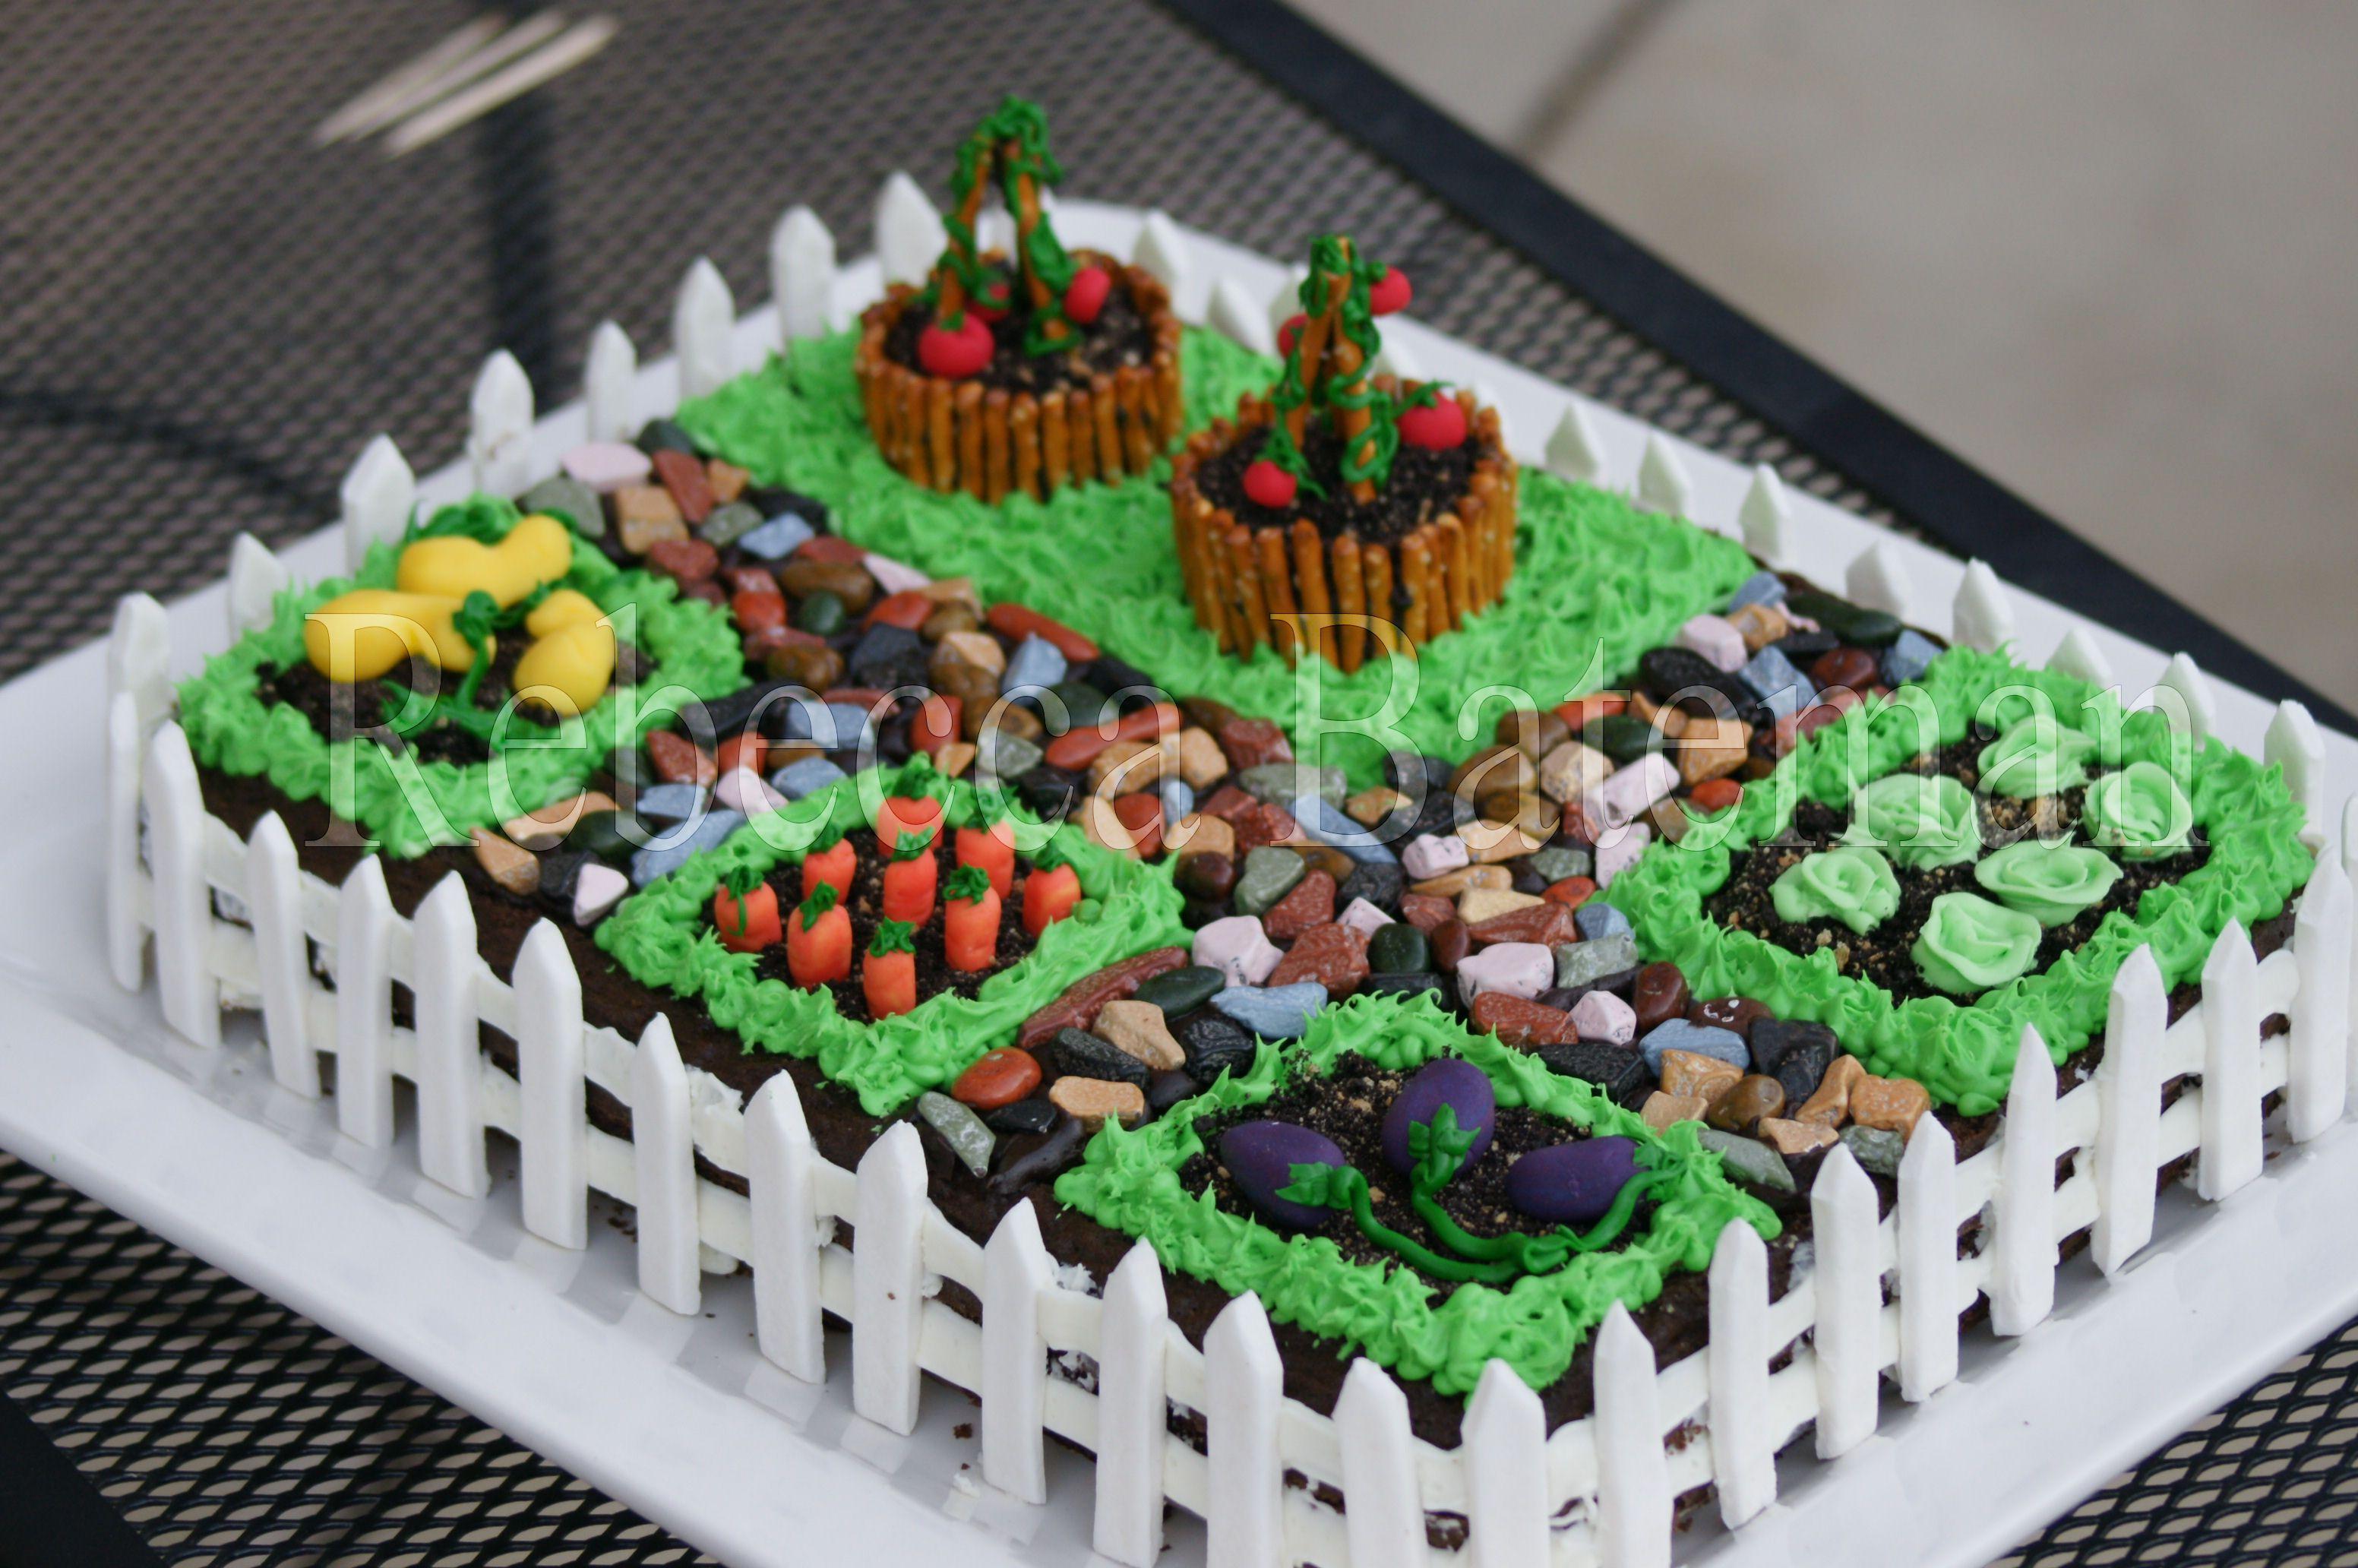 Garden Party Cake Images : gardening birthday party Let Them Eat Cake Pinterest